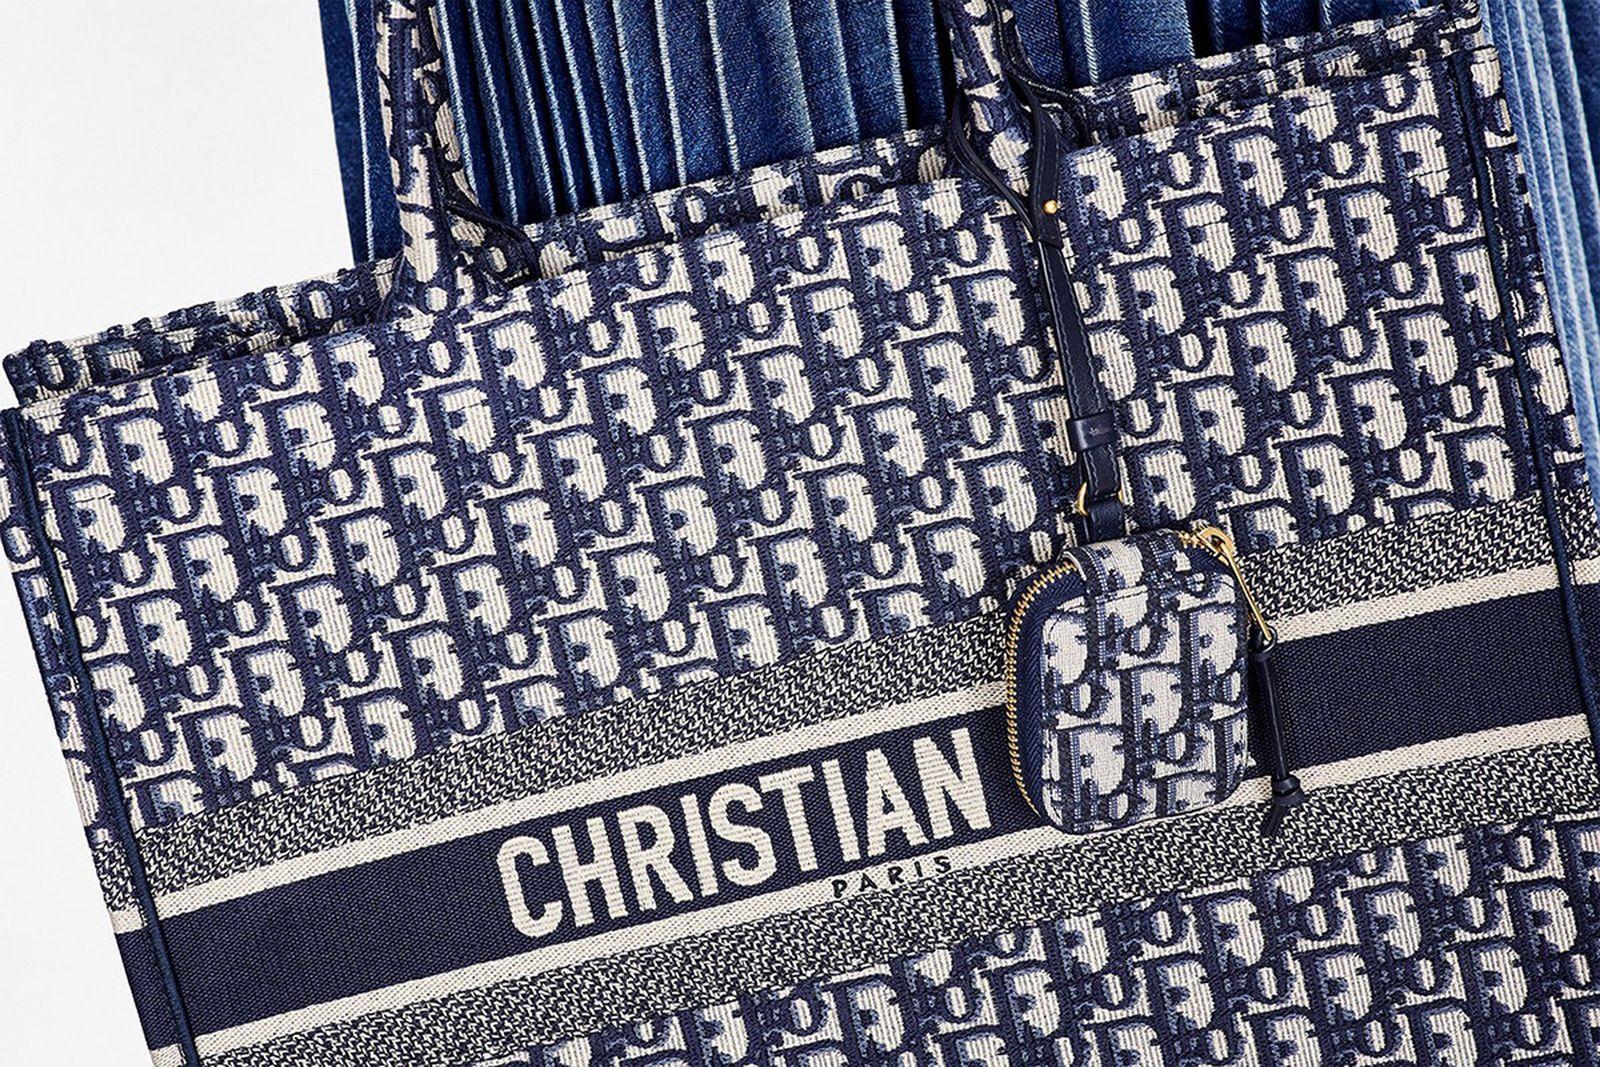 Dior Oblique AirPods Case